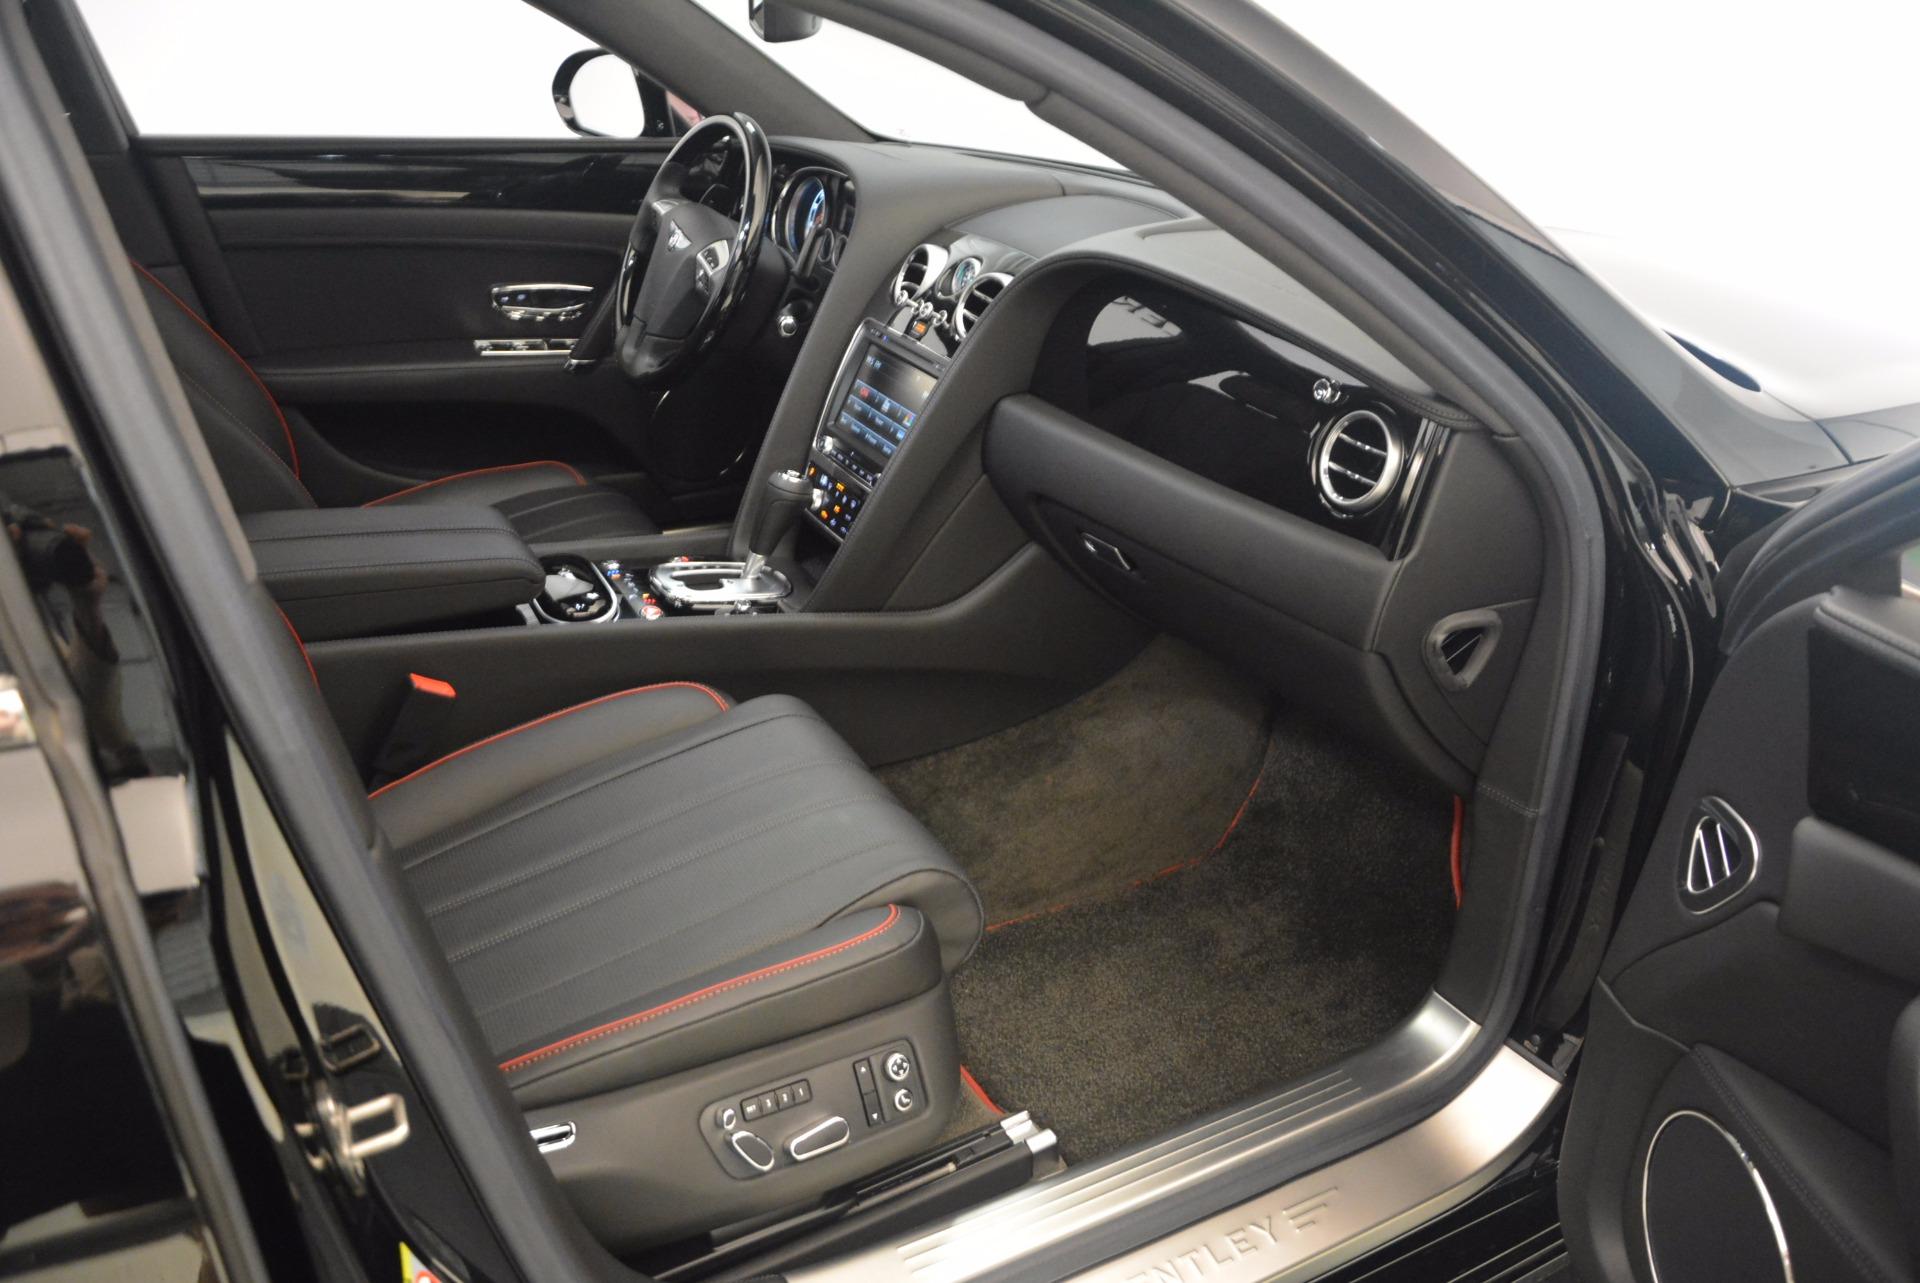 Used 2015 Bentley Flying Spur V8 For Sale In Westport, CT 1199_p41